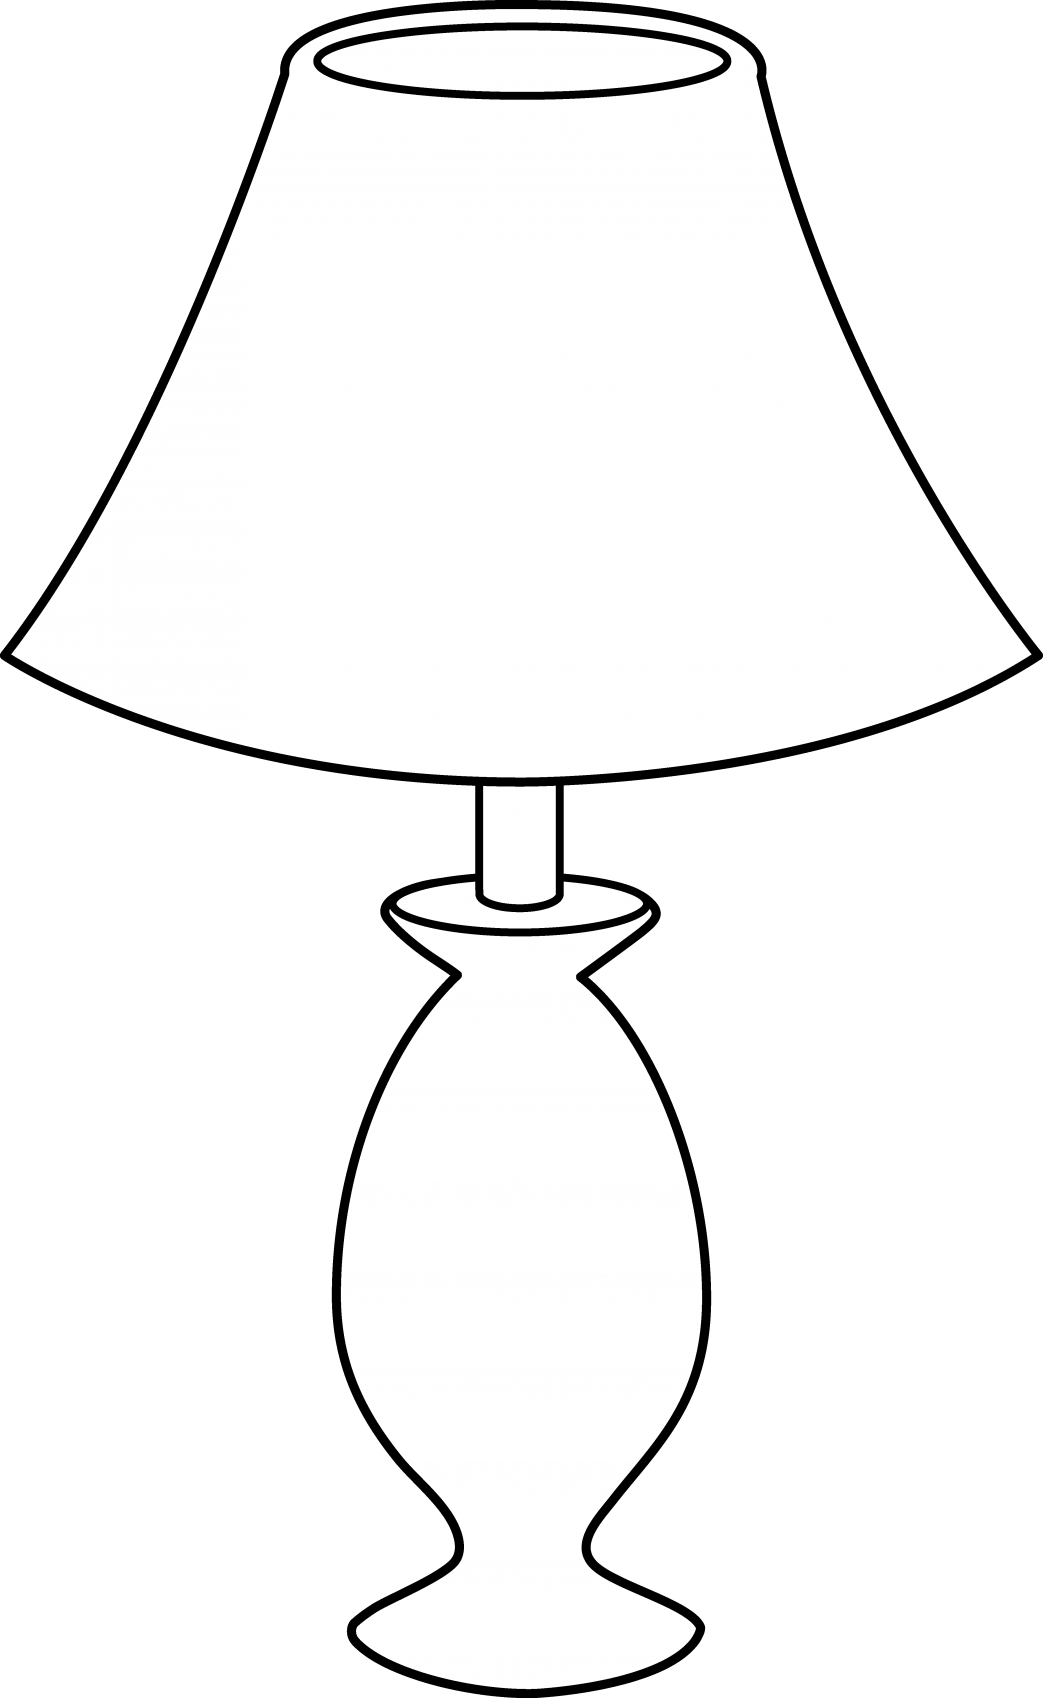 Lamp clipart tall lamp. Glamorous desk lamps at